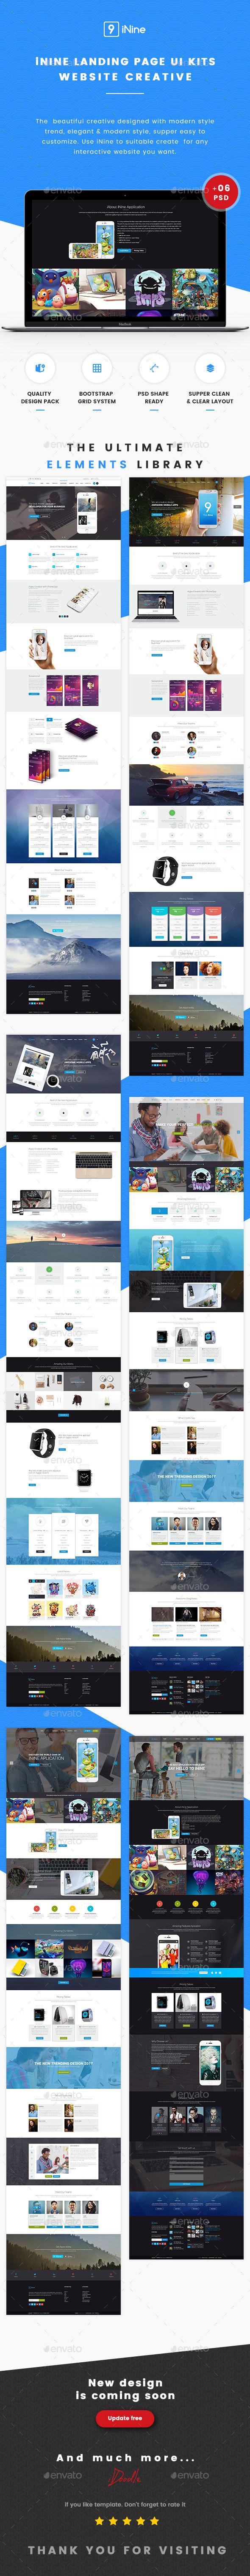 Nine UI Kits Landing Pages & Web Design Template - User Interfaces Web Elements